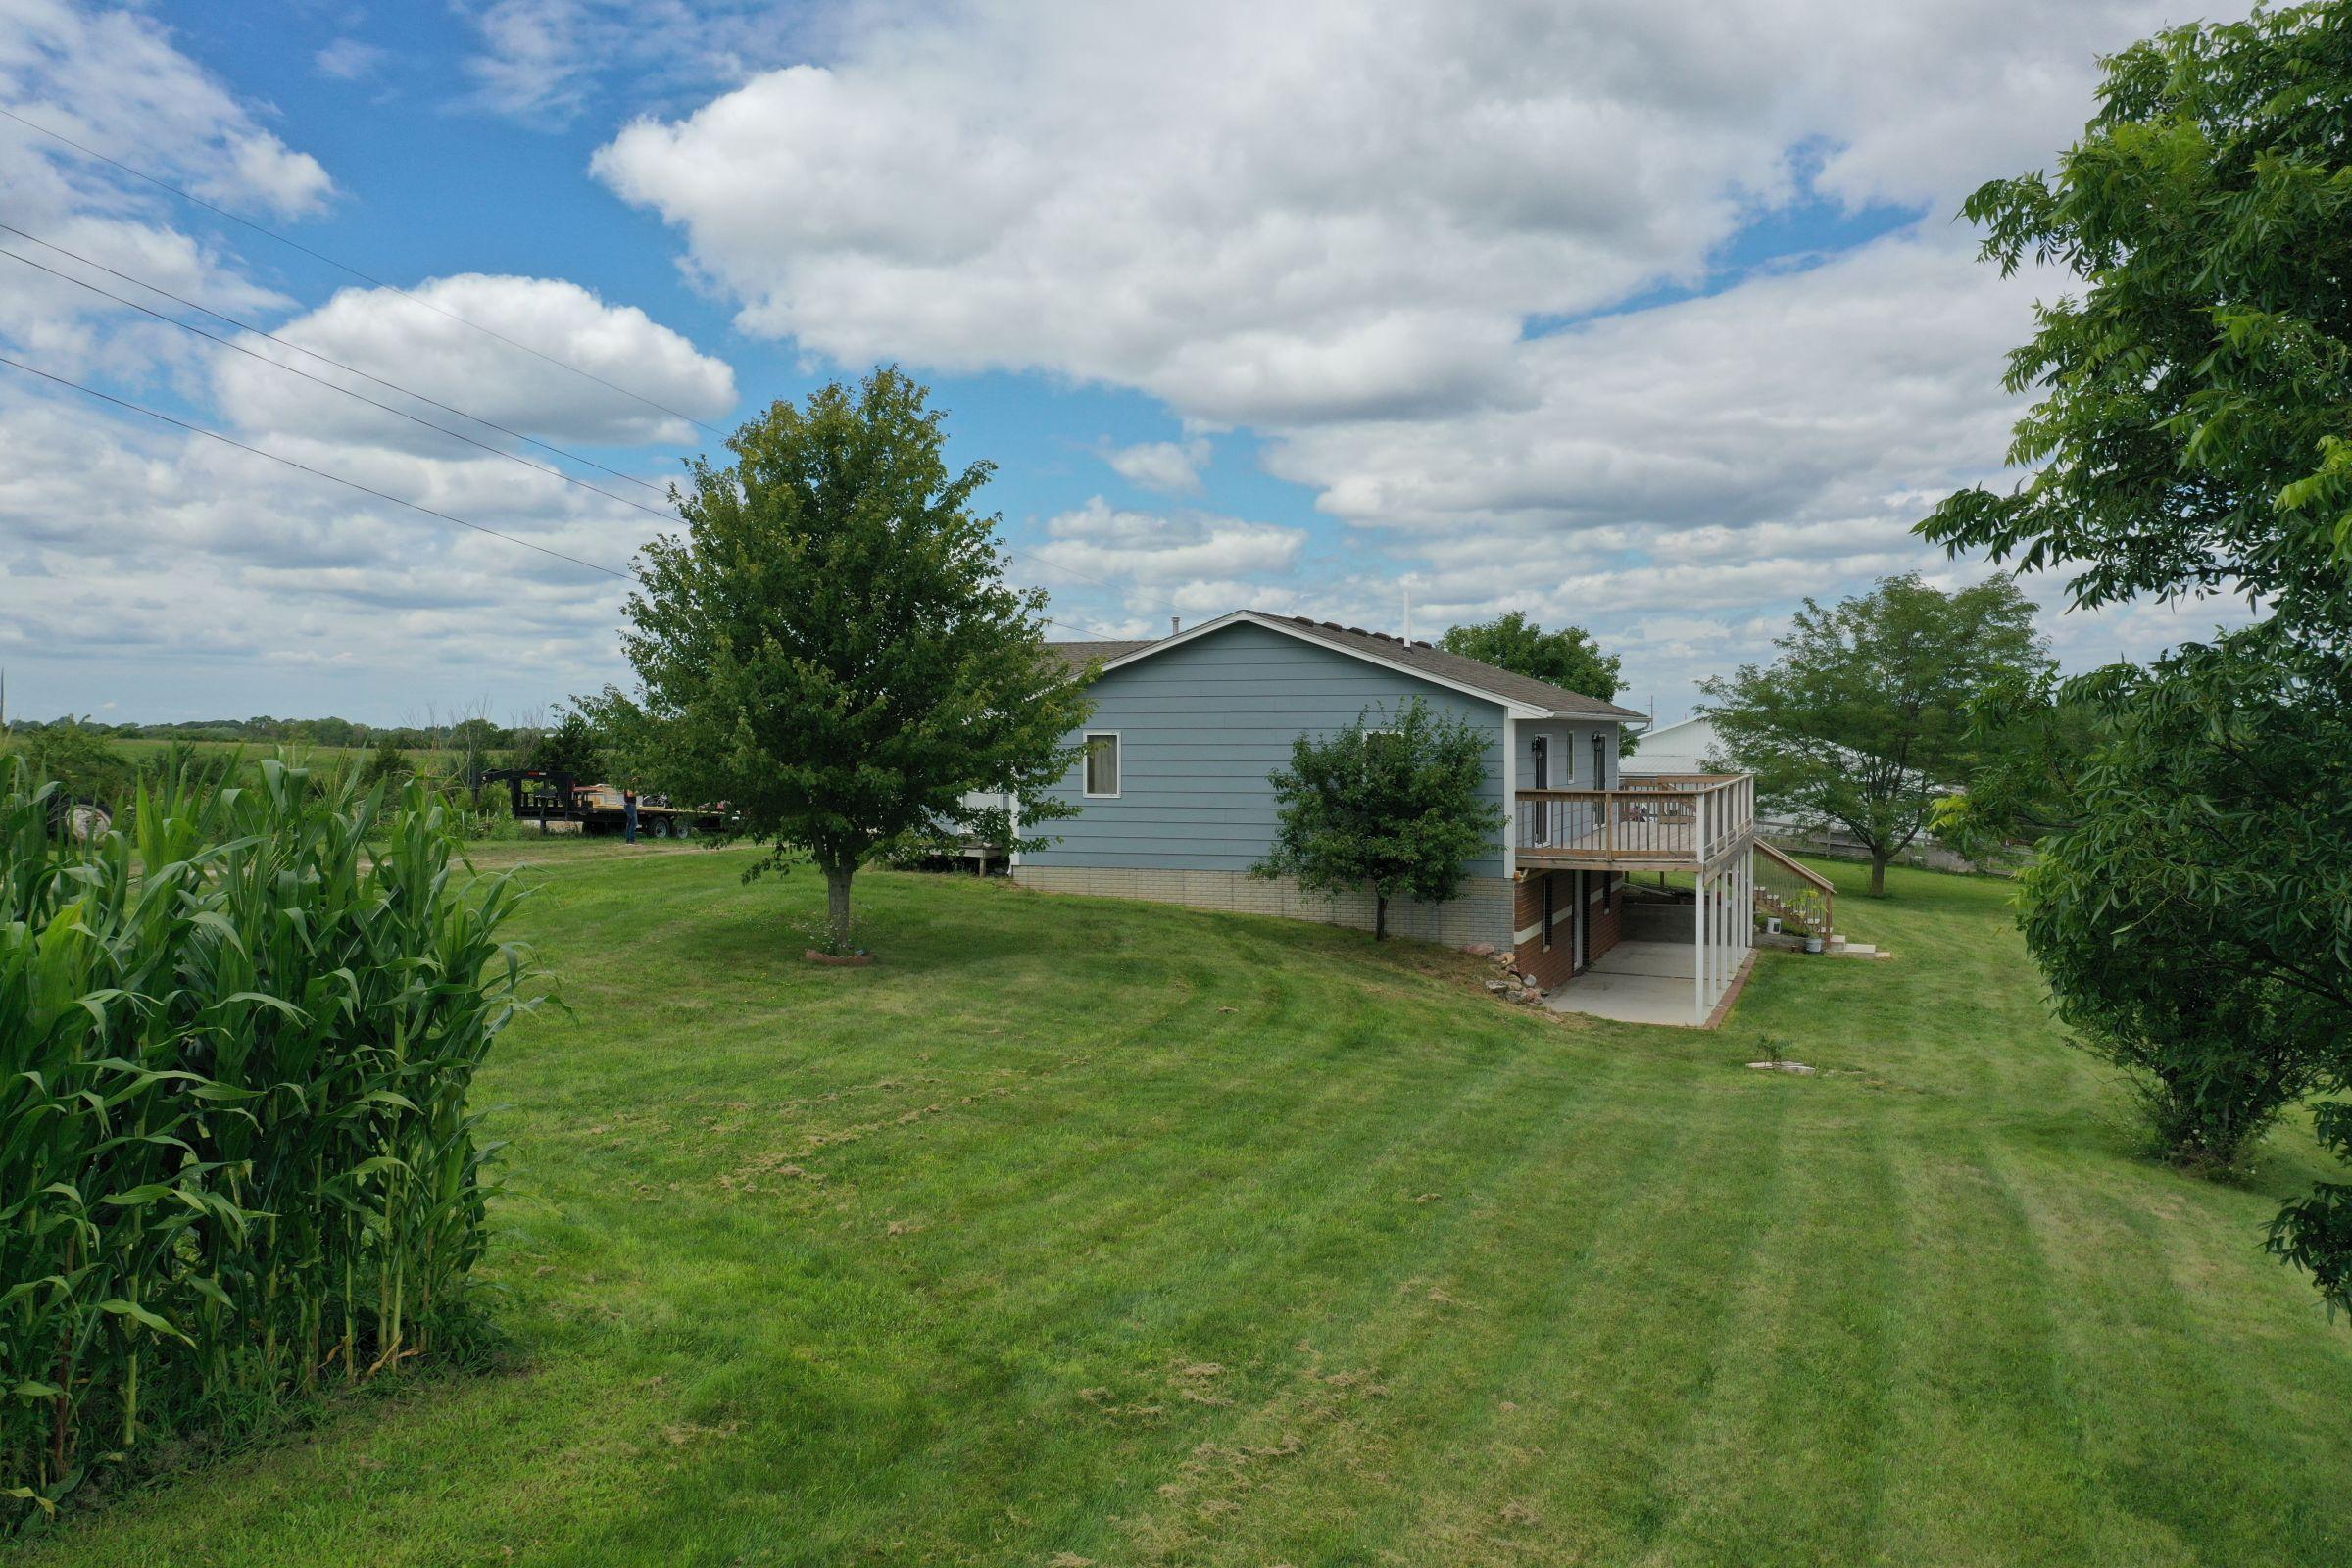 residential-warren-county-iowa-12-acres-listing-number-15104-4-2020-08-08-185053.jpg